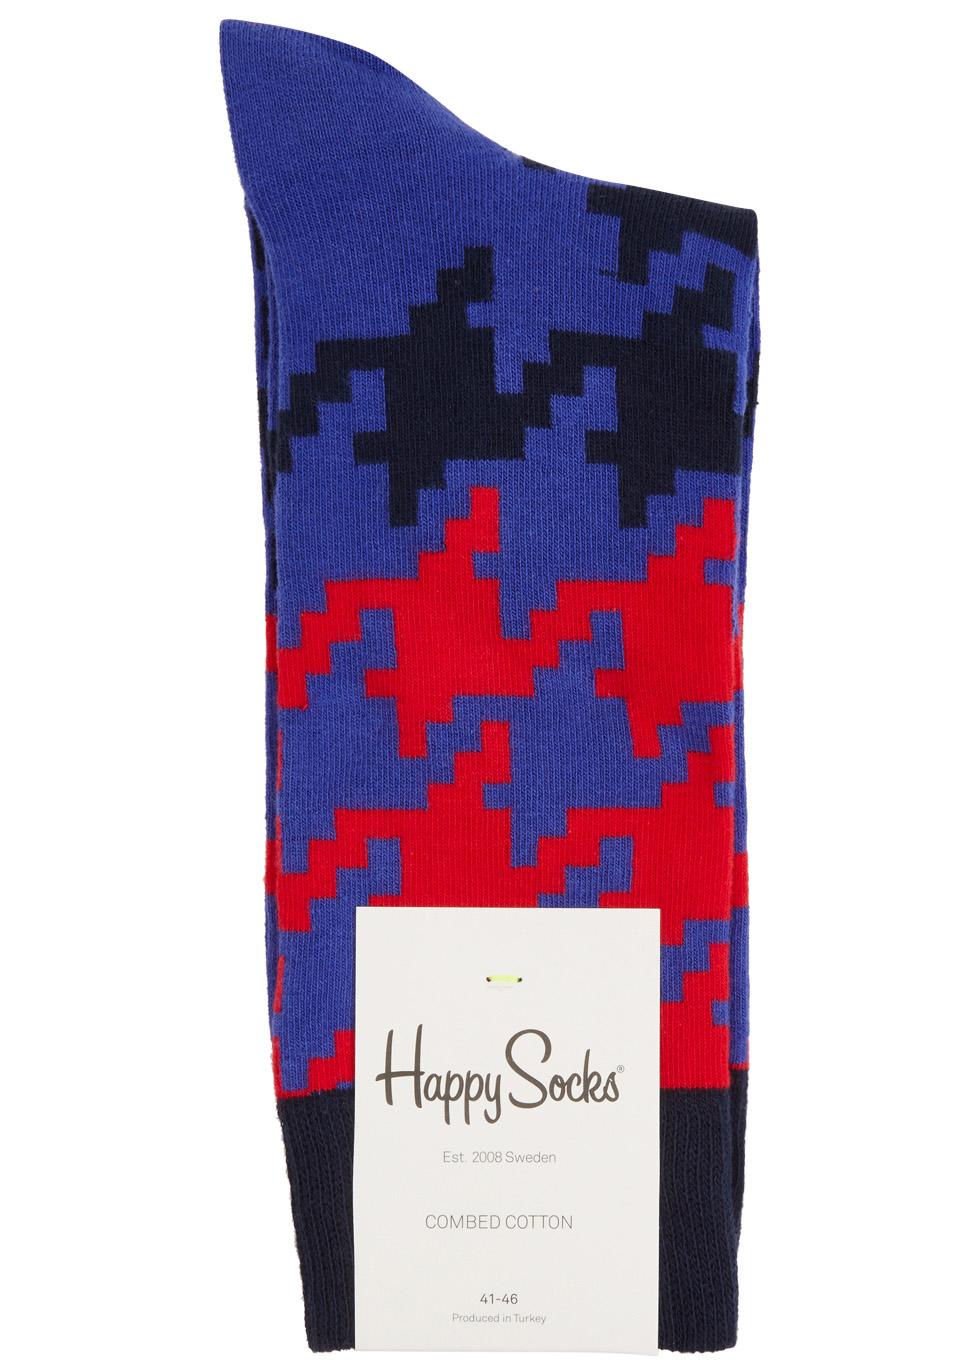 Dogtooth cotton blend socks - Happy Socks